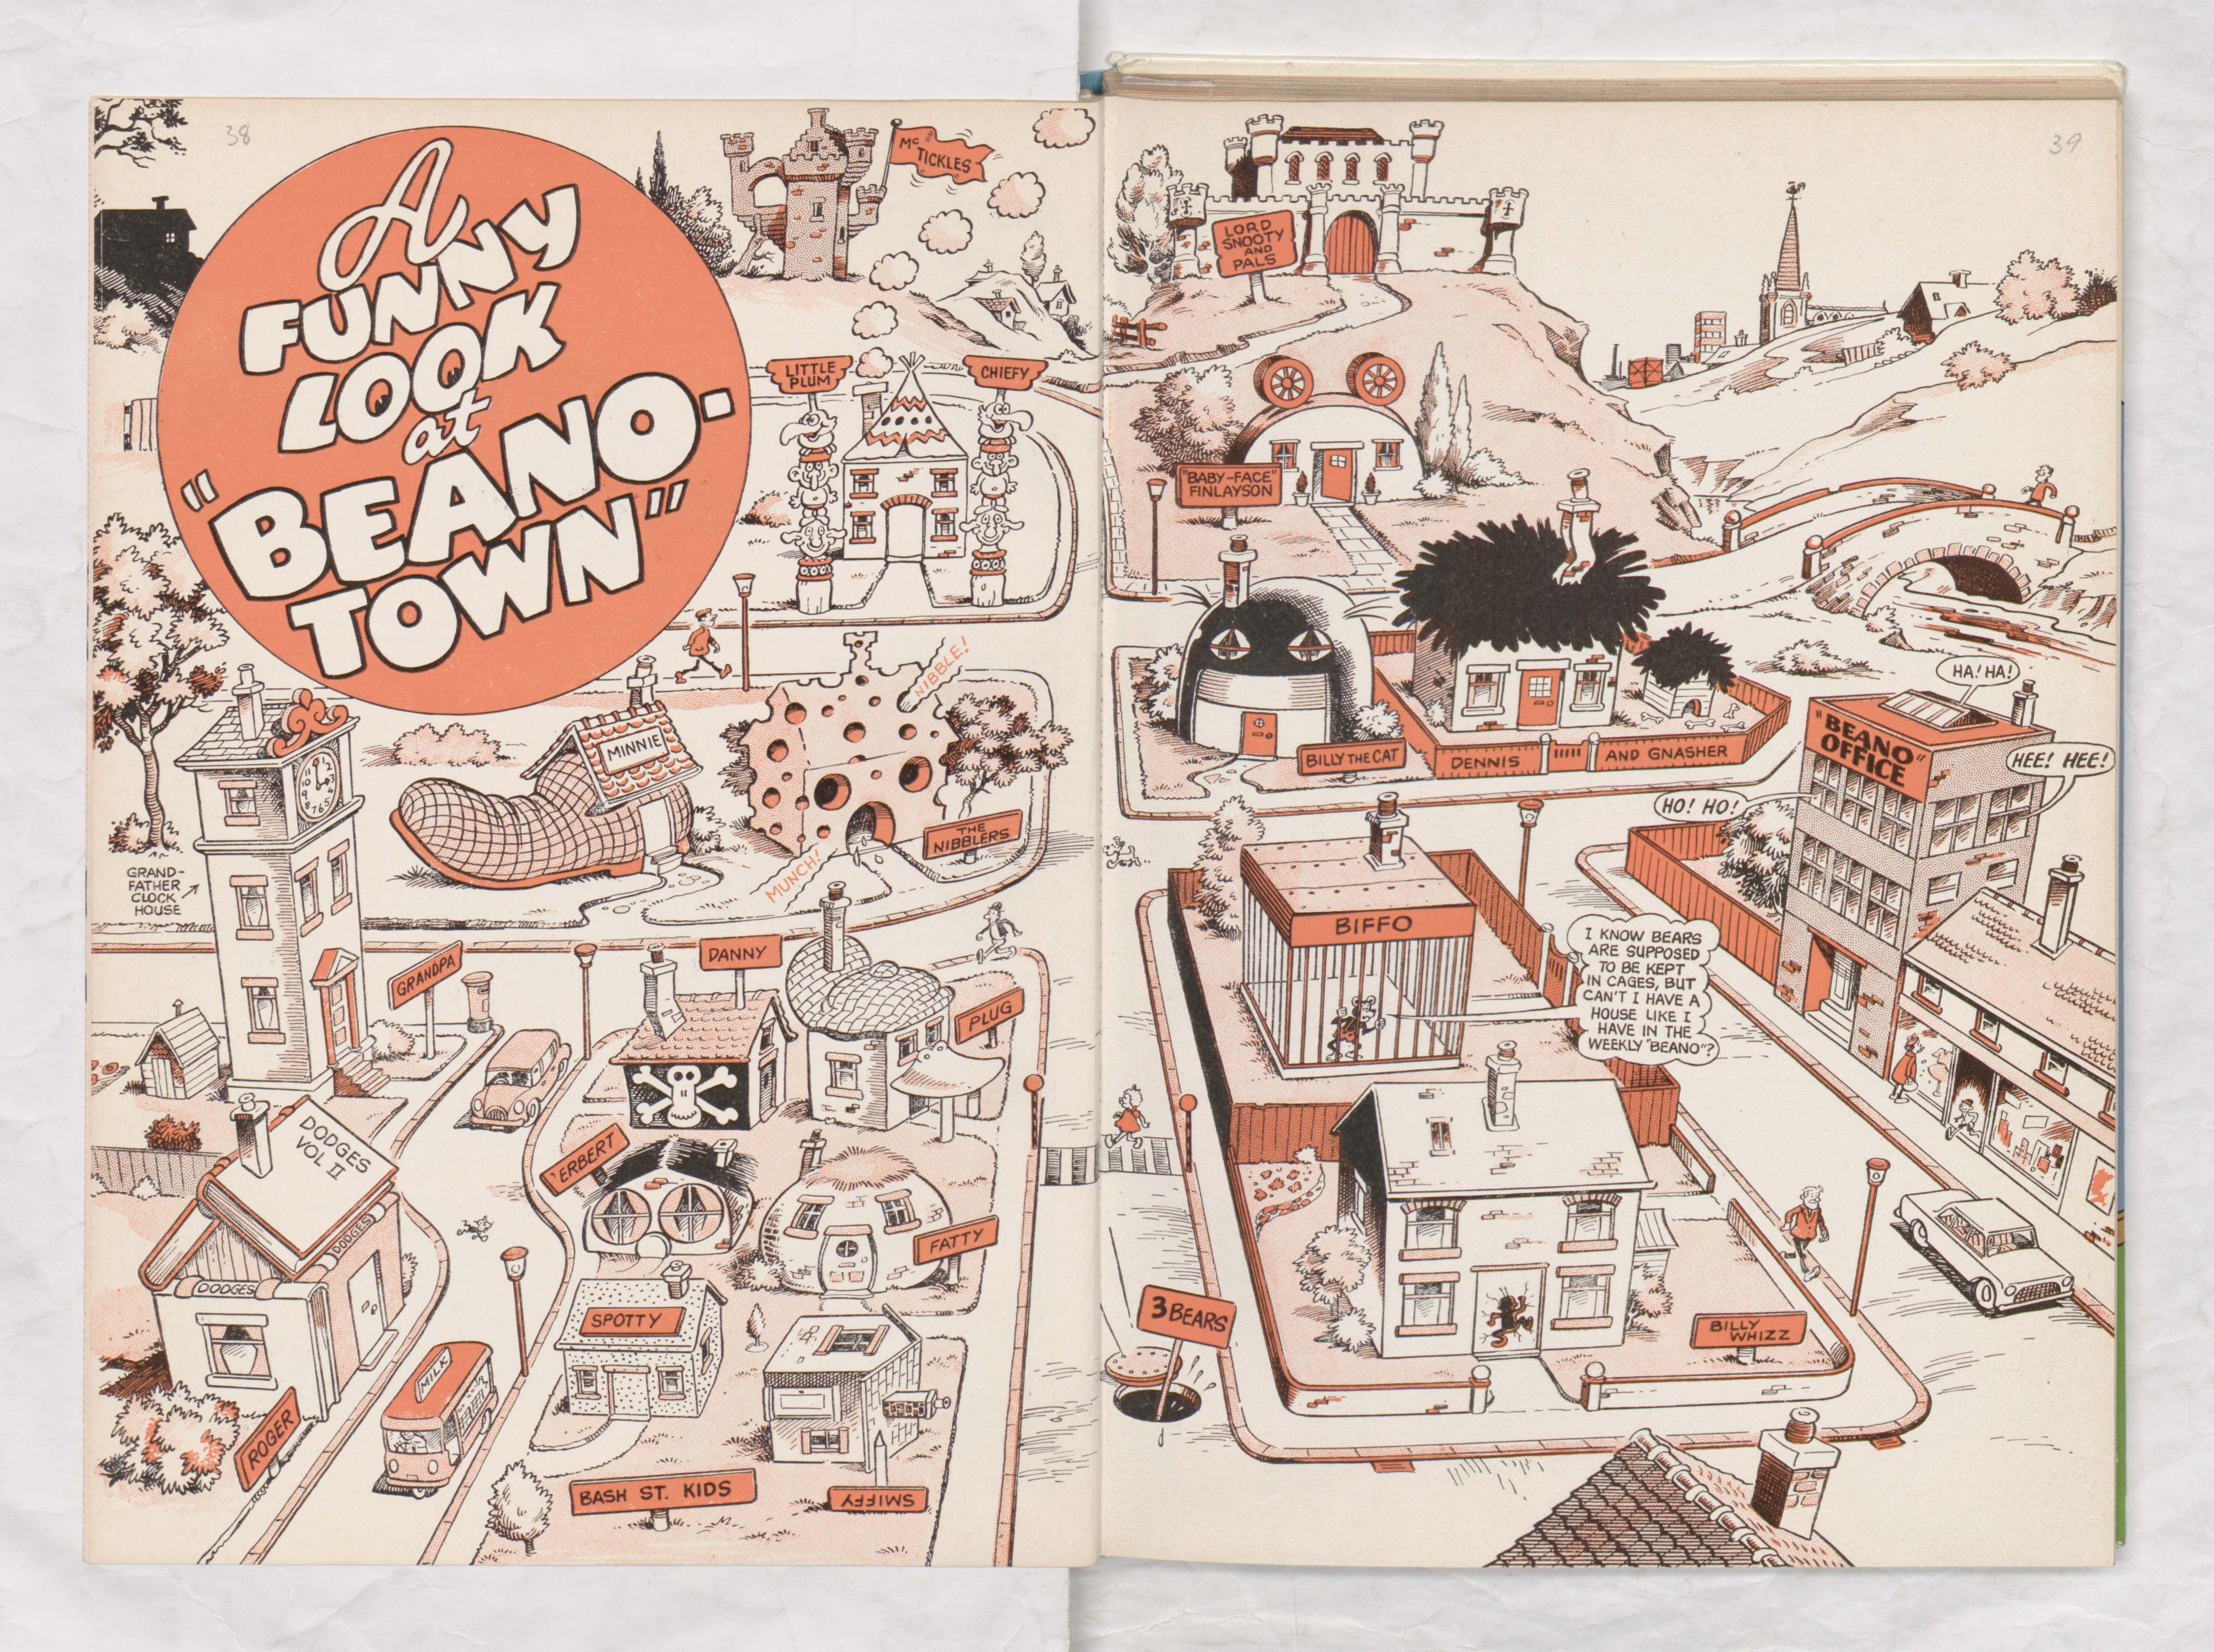 Beanotown - Beano Book 1974 Annual